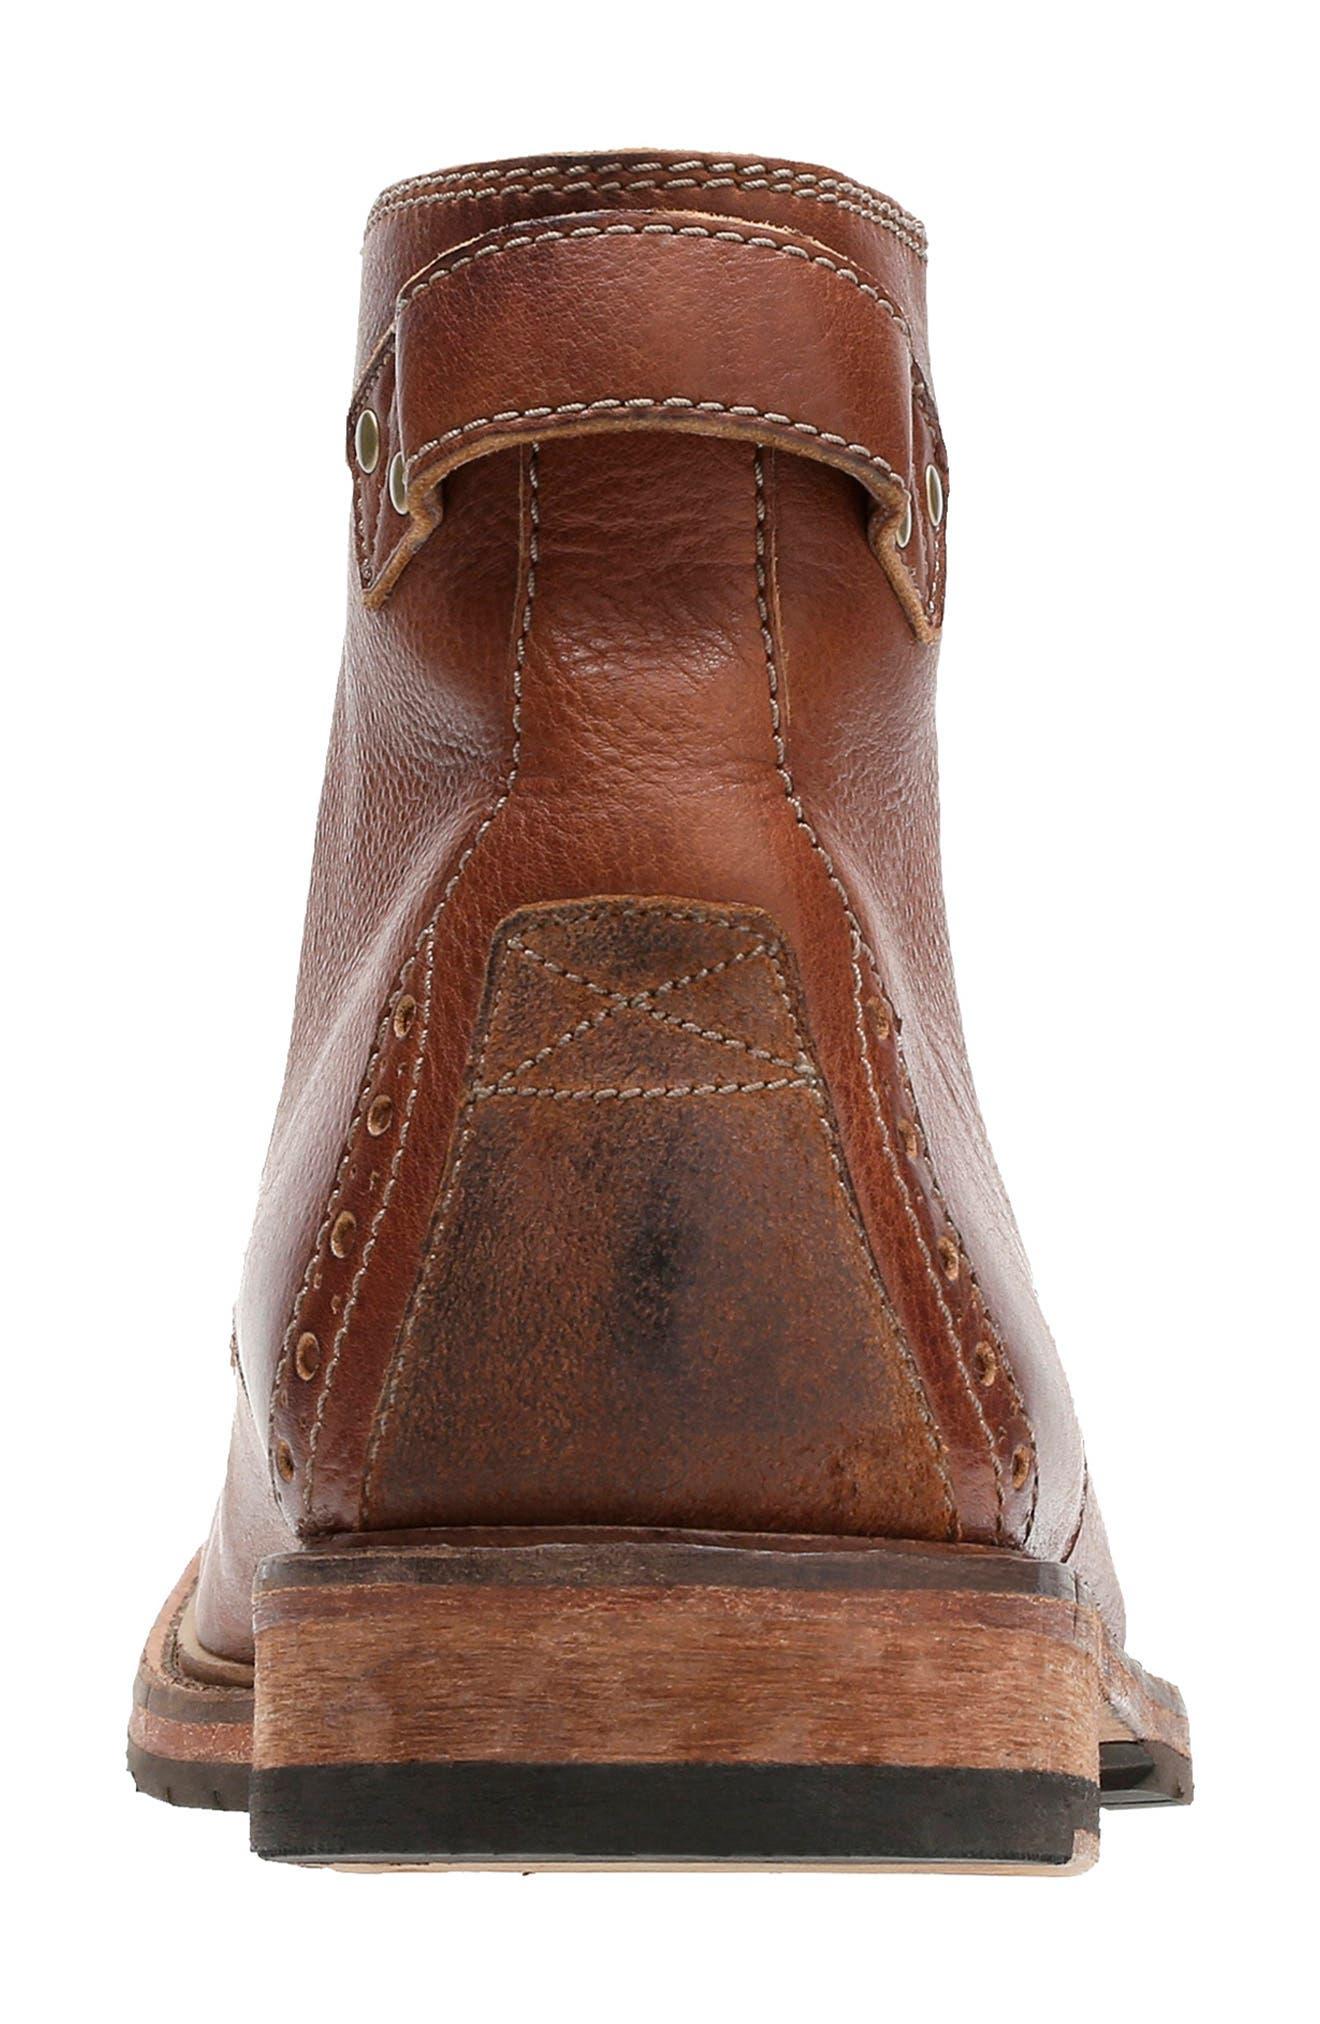 Clarkdale Bud Plain Toe Boot,                             Alternate thumbnail 5, color,                             DARK TAN LEATHER